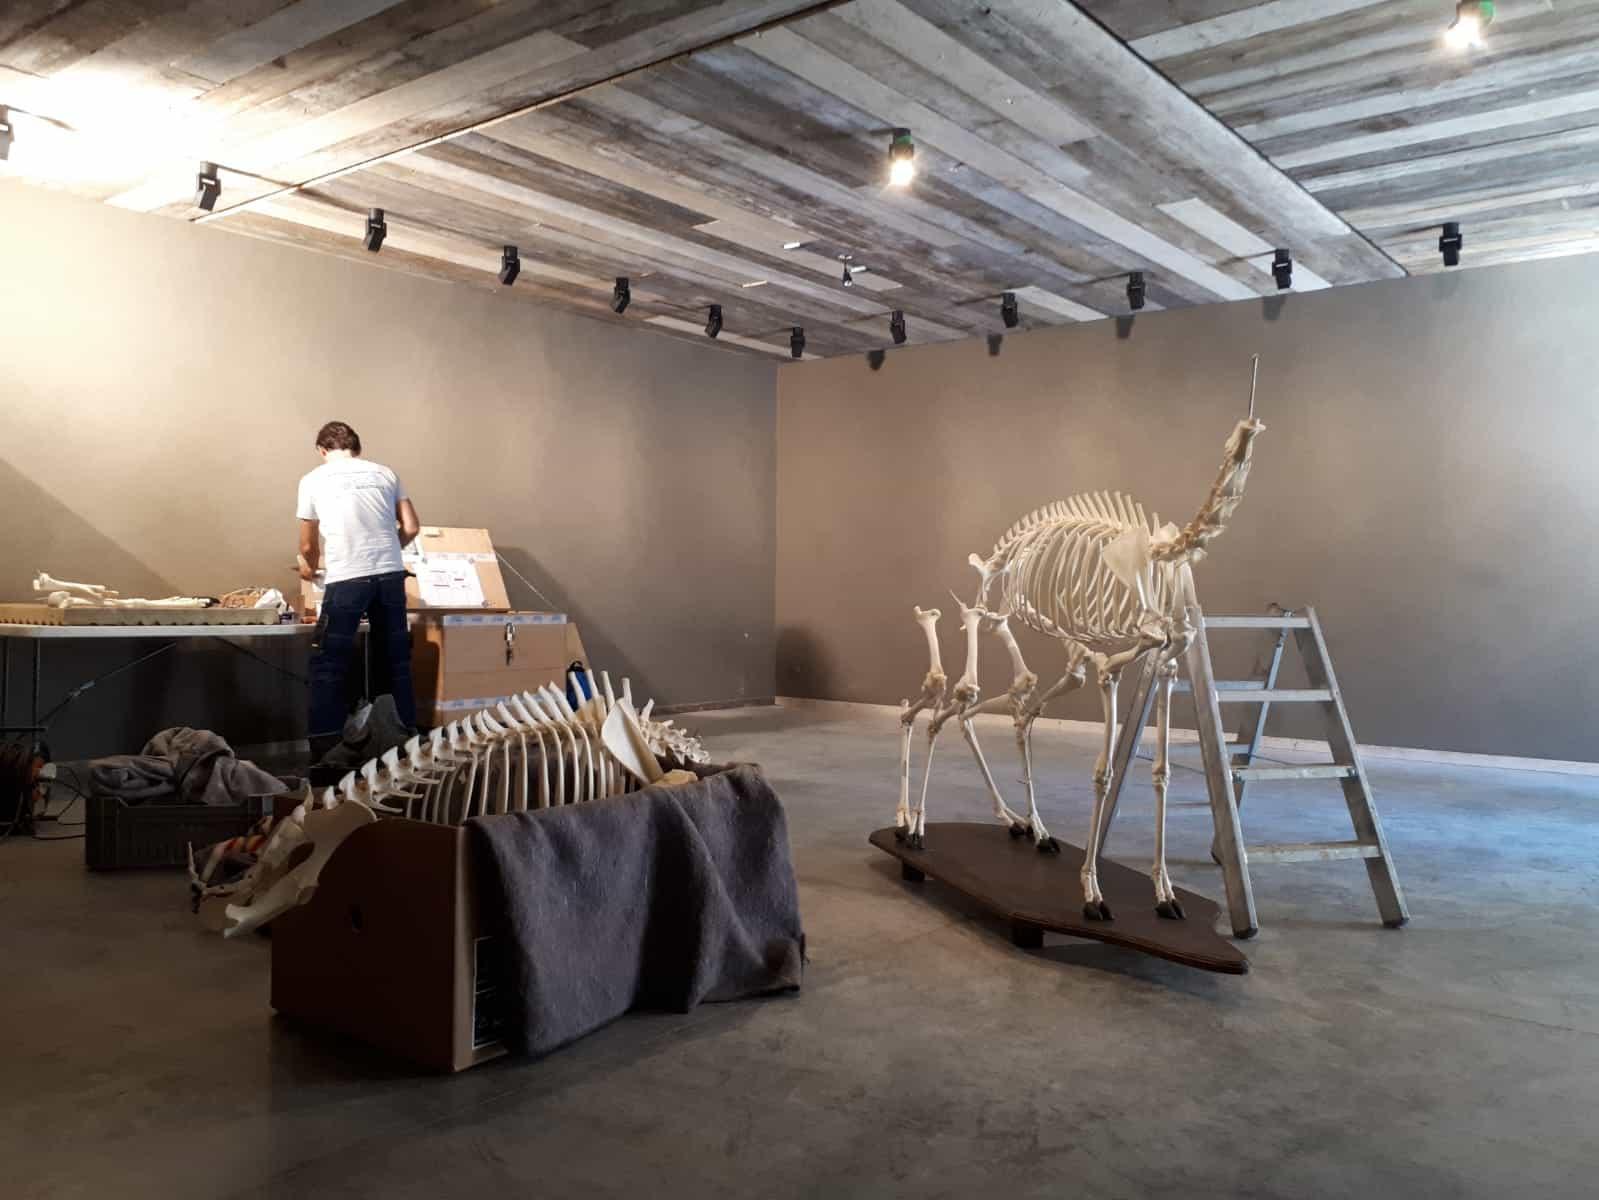 Skelette | Montage vor Ort | Limburghuis GAIA Zoo